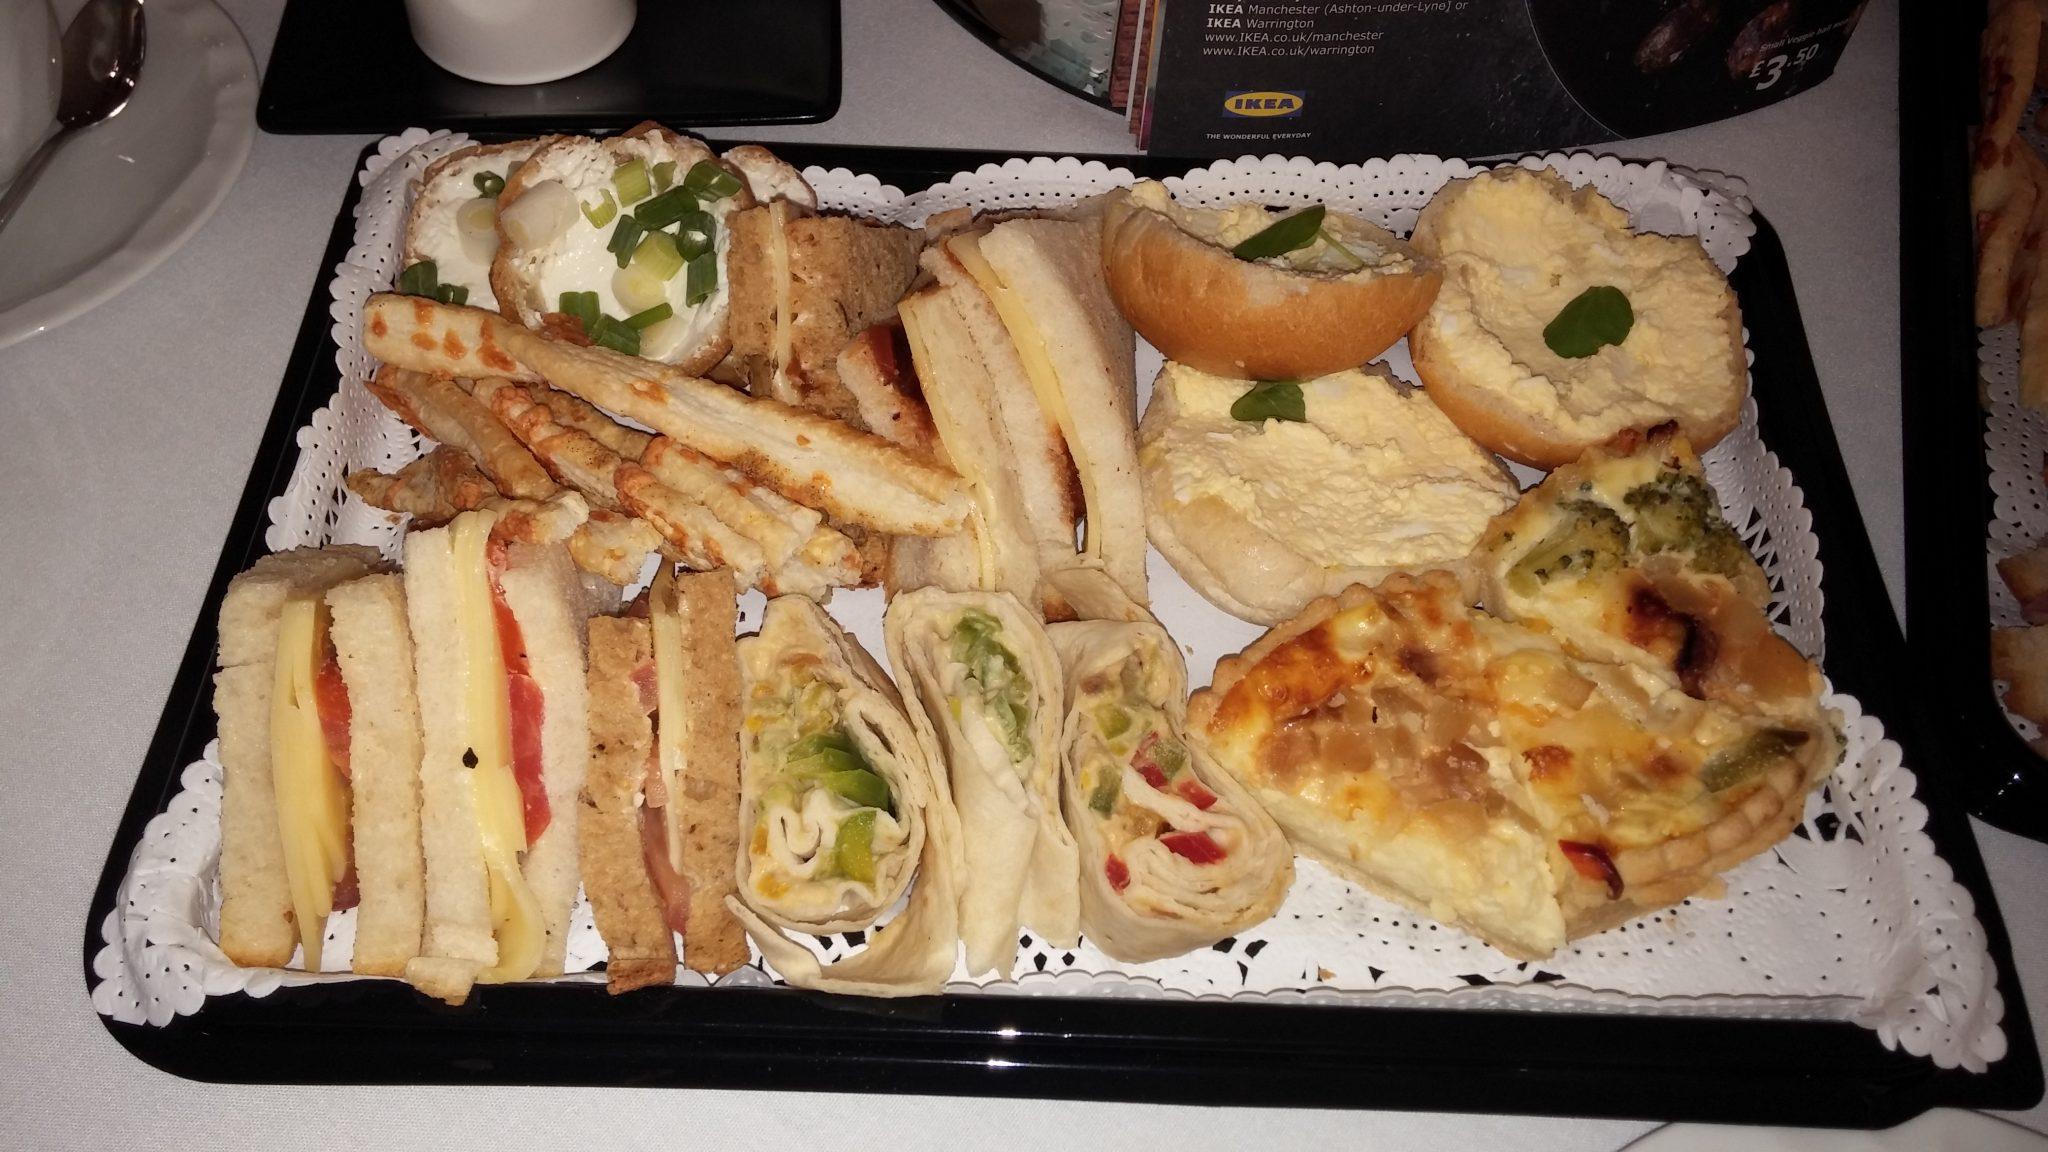 _Slattery sandwiches